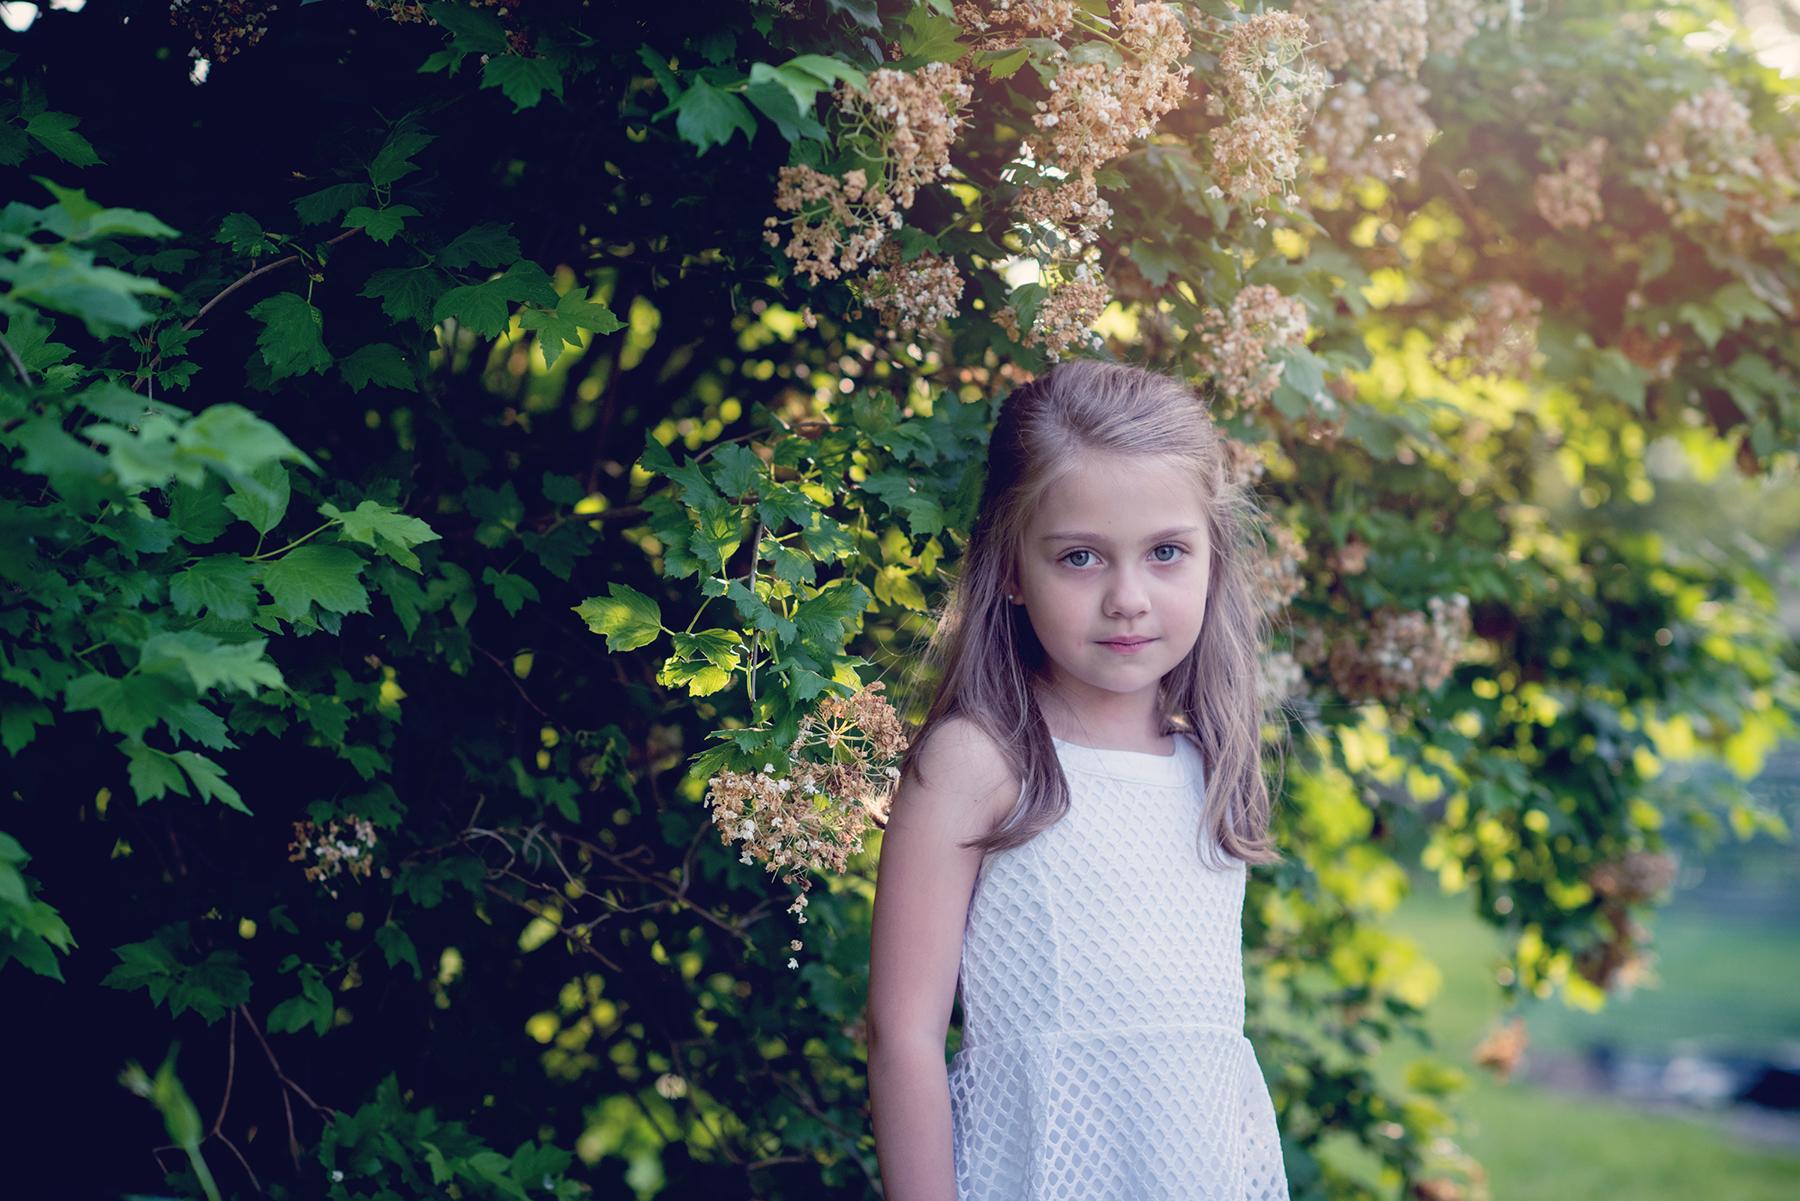 Bridget_WS009.jpg